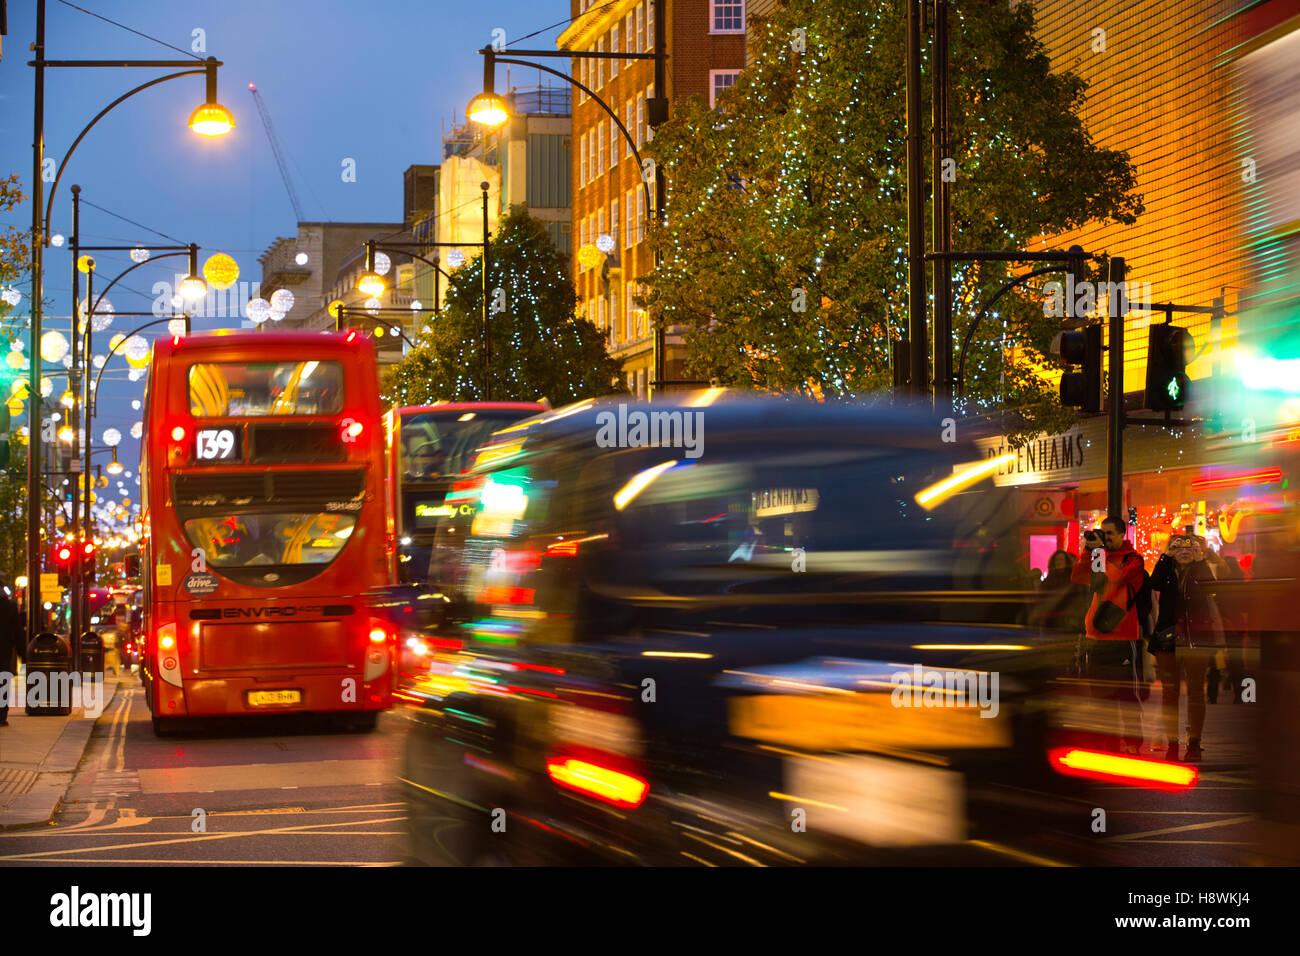 Oxford Street, Central London, England, United Kingdom - Stock Image